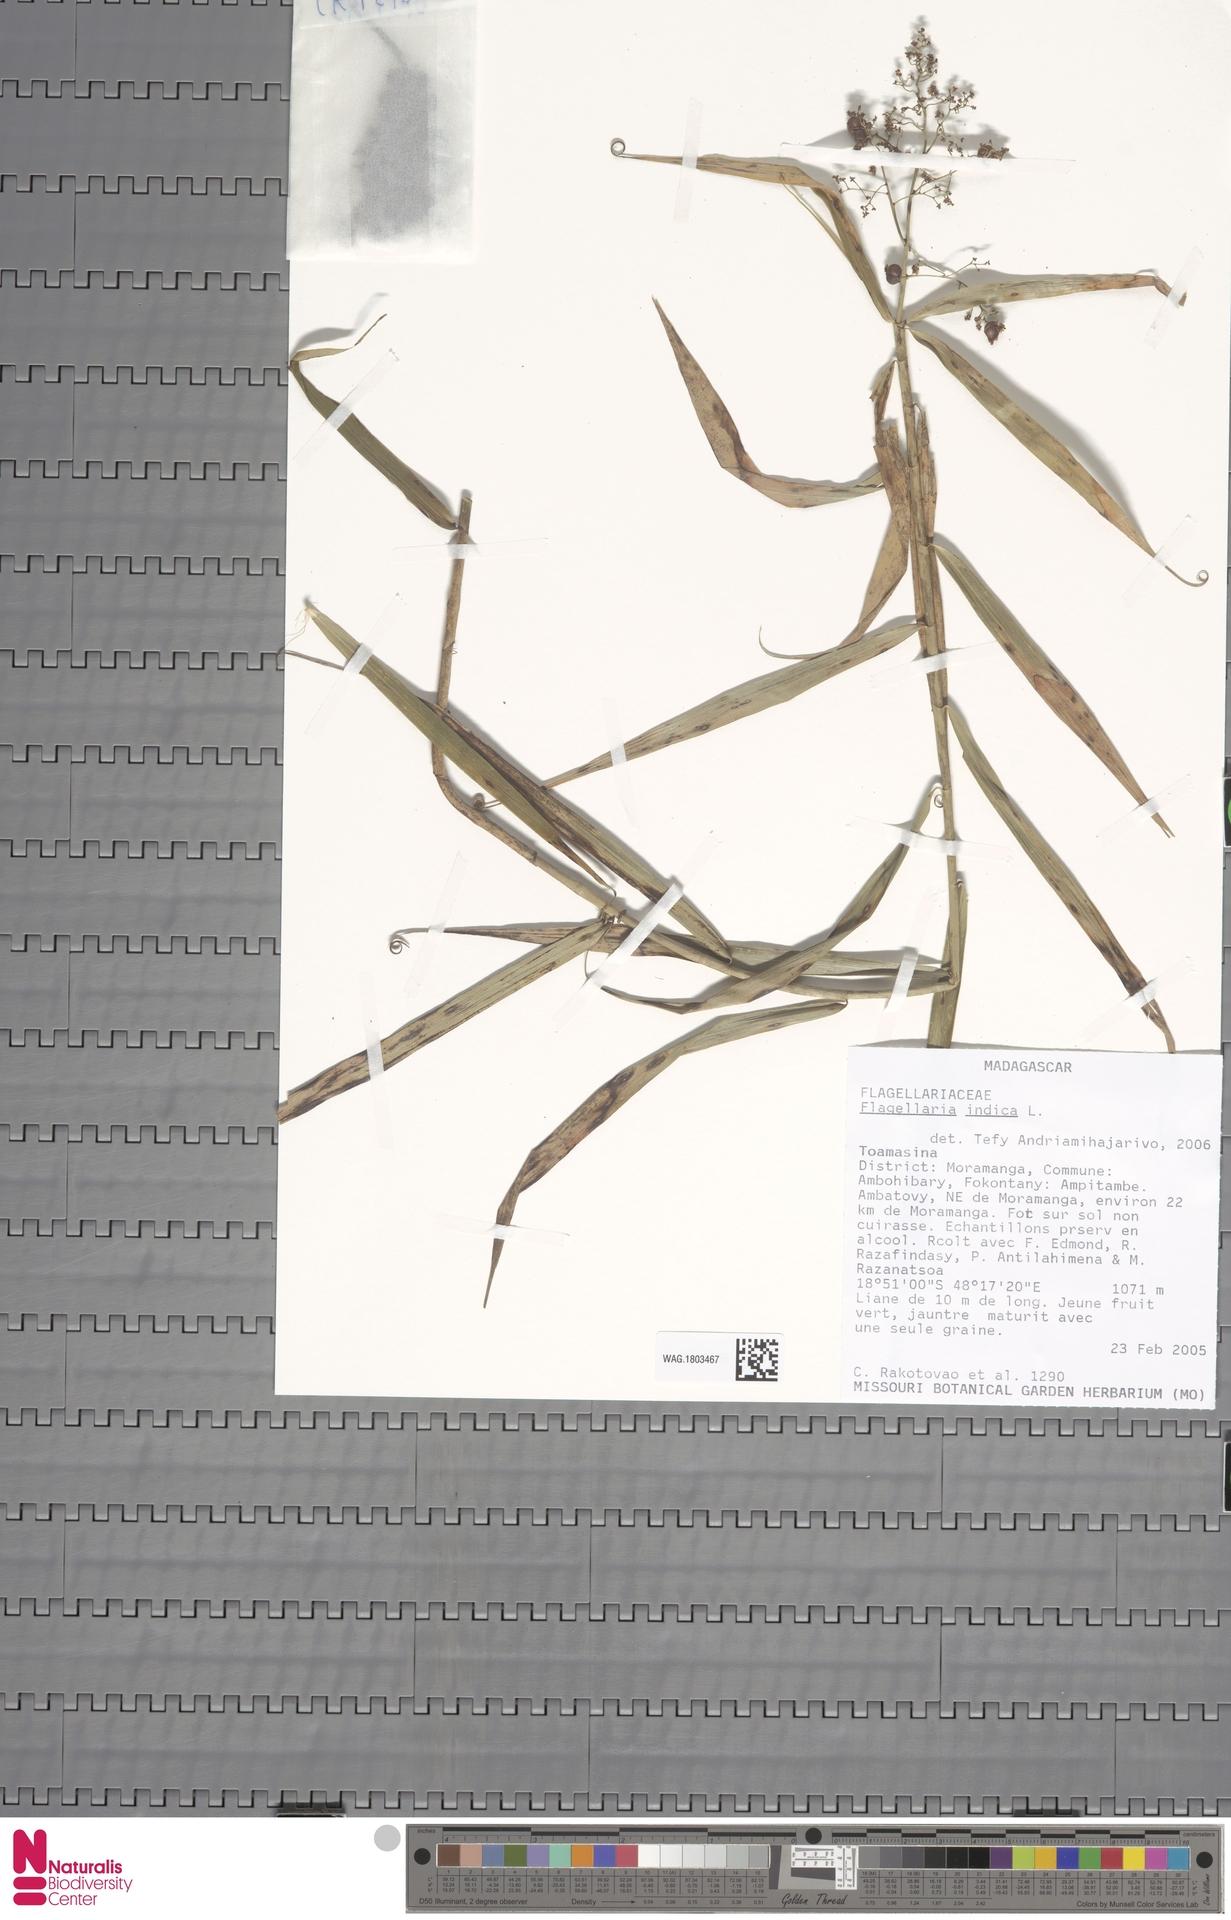 WAG.1803467 | Flagellaria indica L.